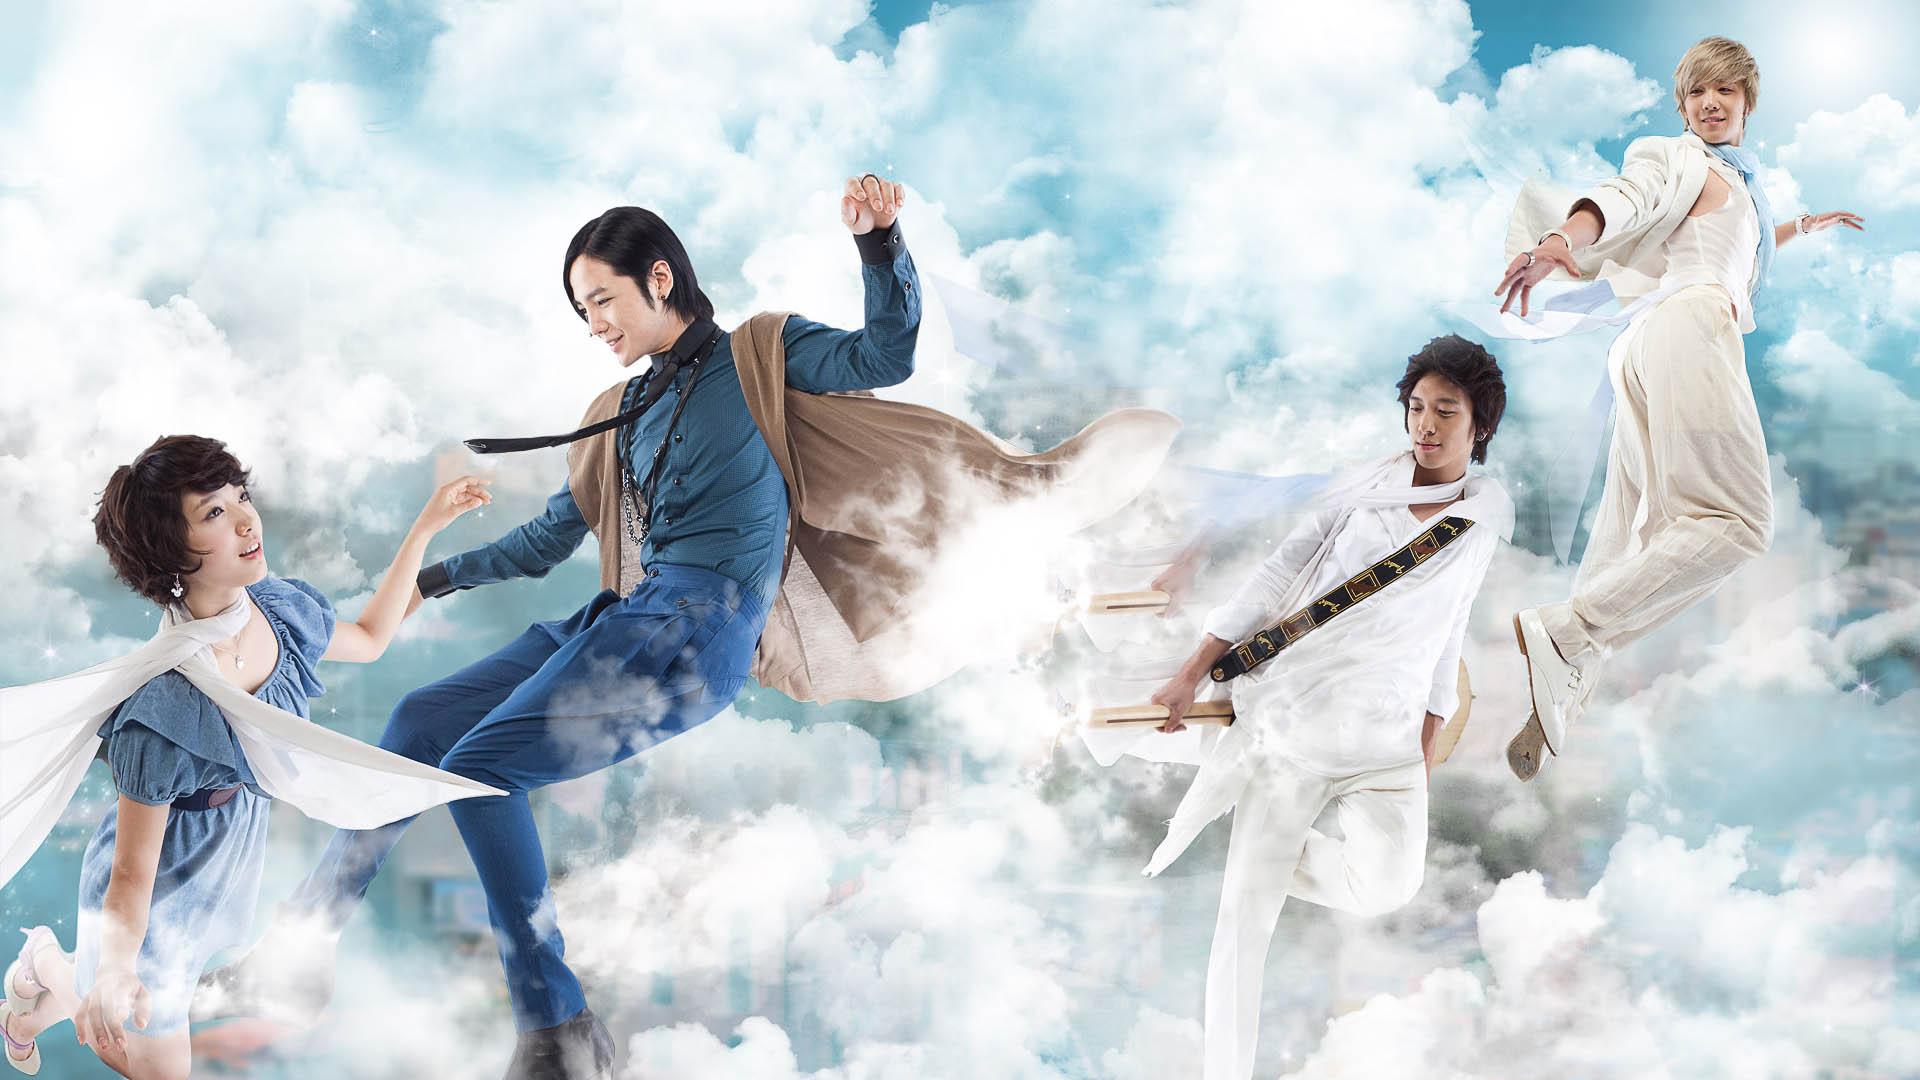 You Re Beautiful Korean Drama Summary Wallpaper PicsWallpapercom 1920x1080